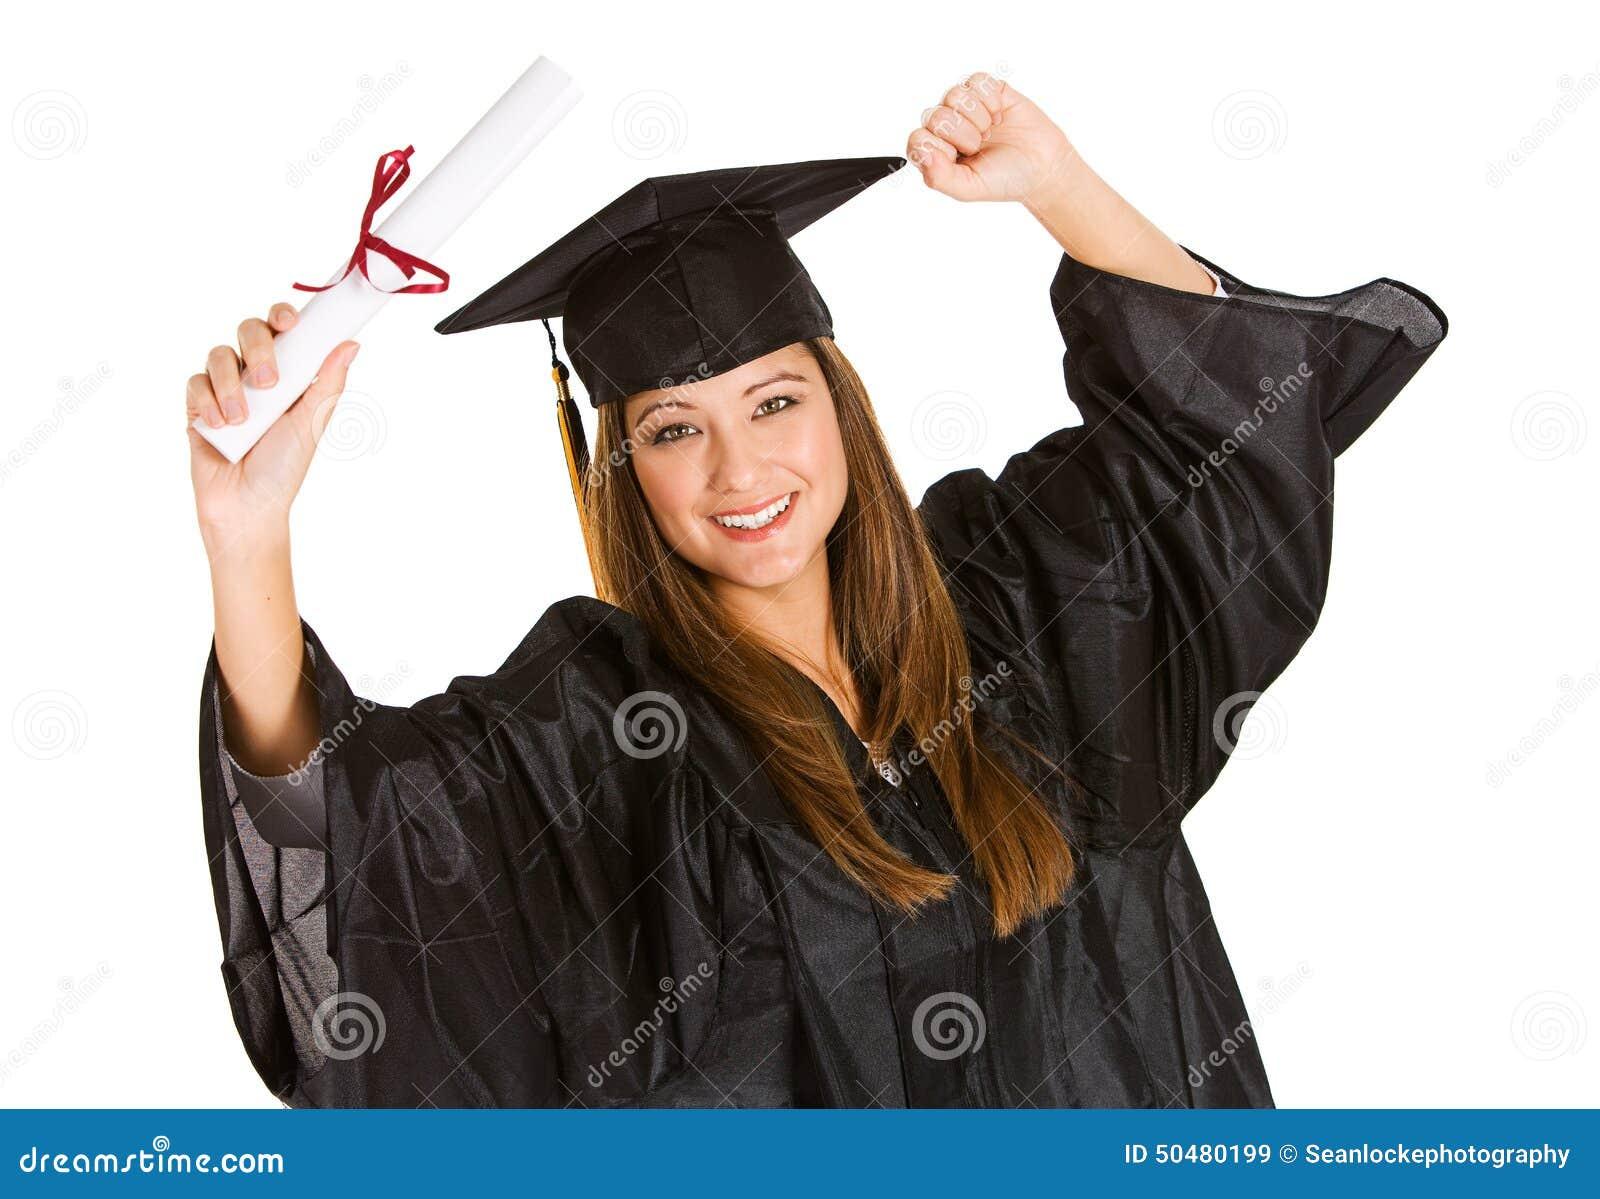 graduate woman cheering for recent graduation stock image image